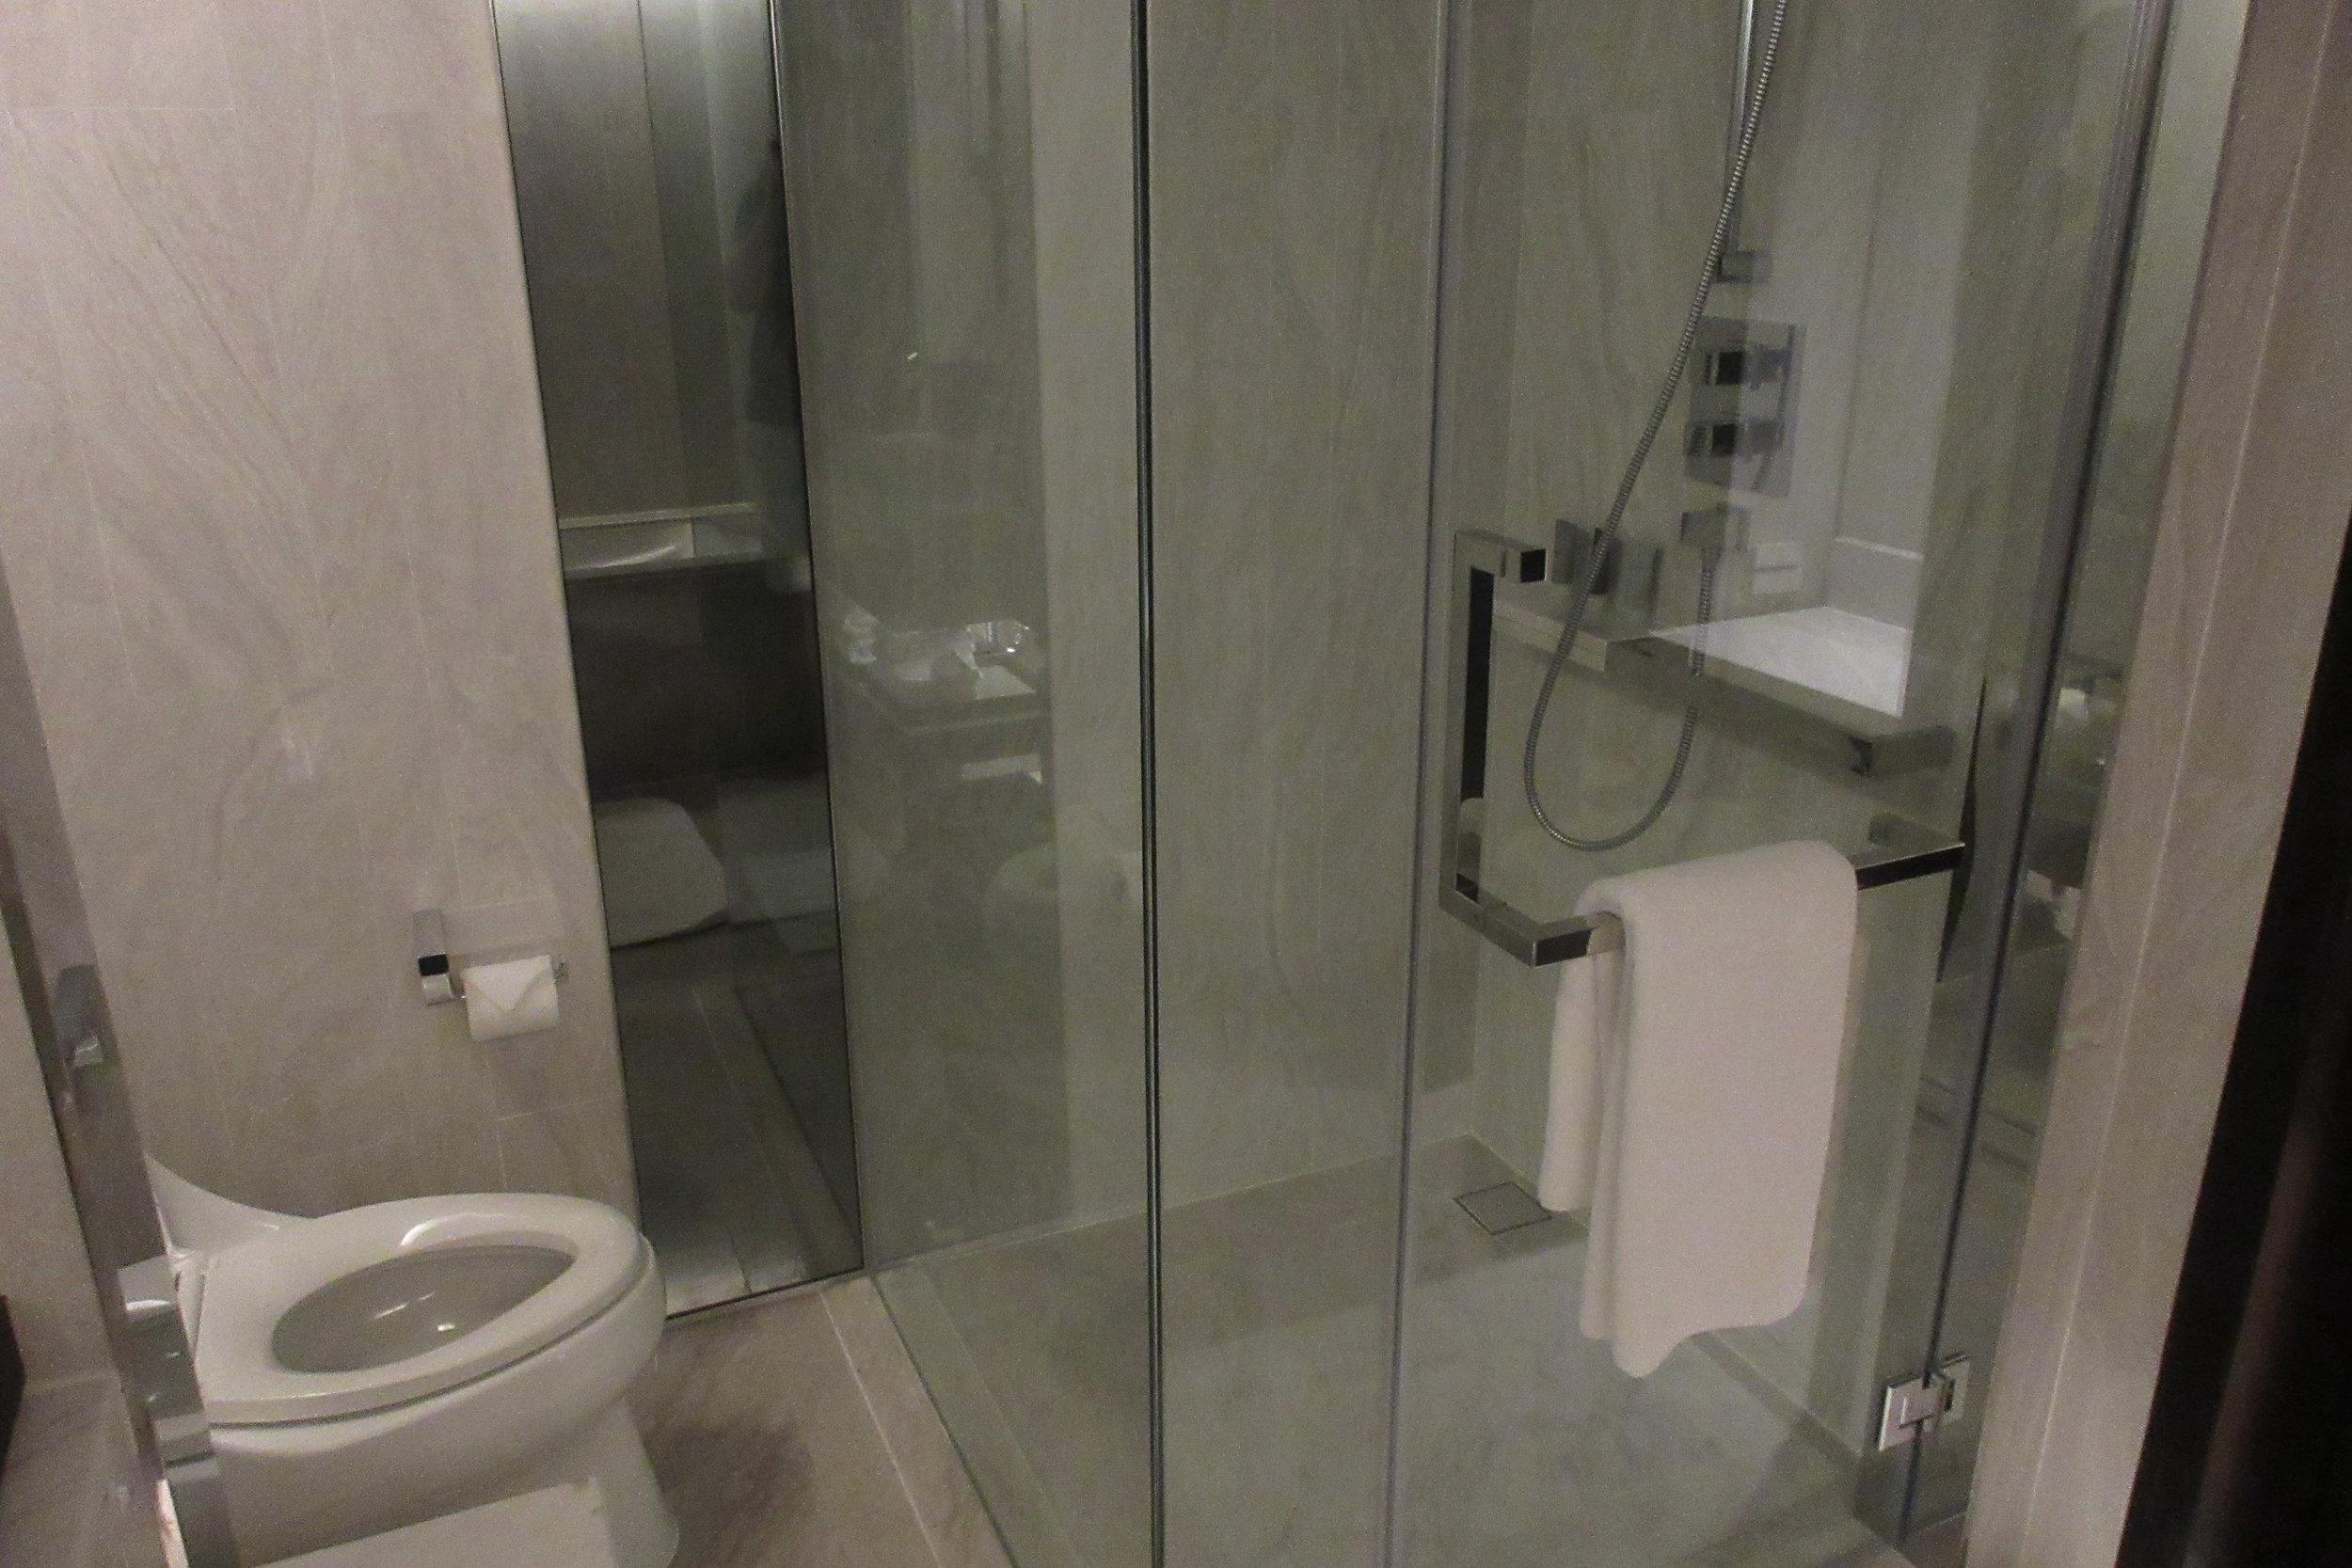 JW Marriott Bangkok – Toilet and shower